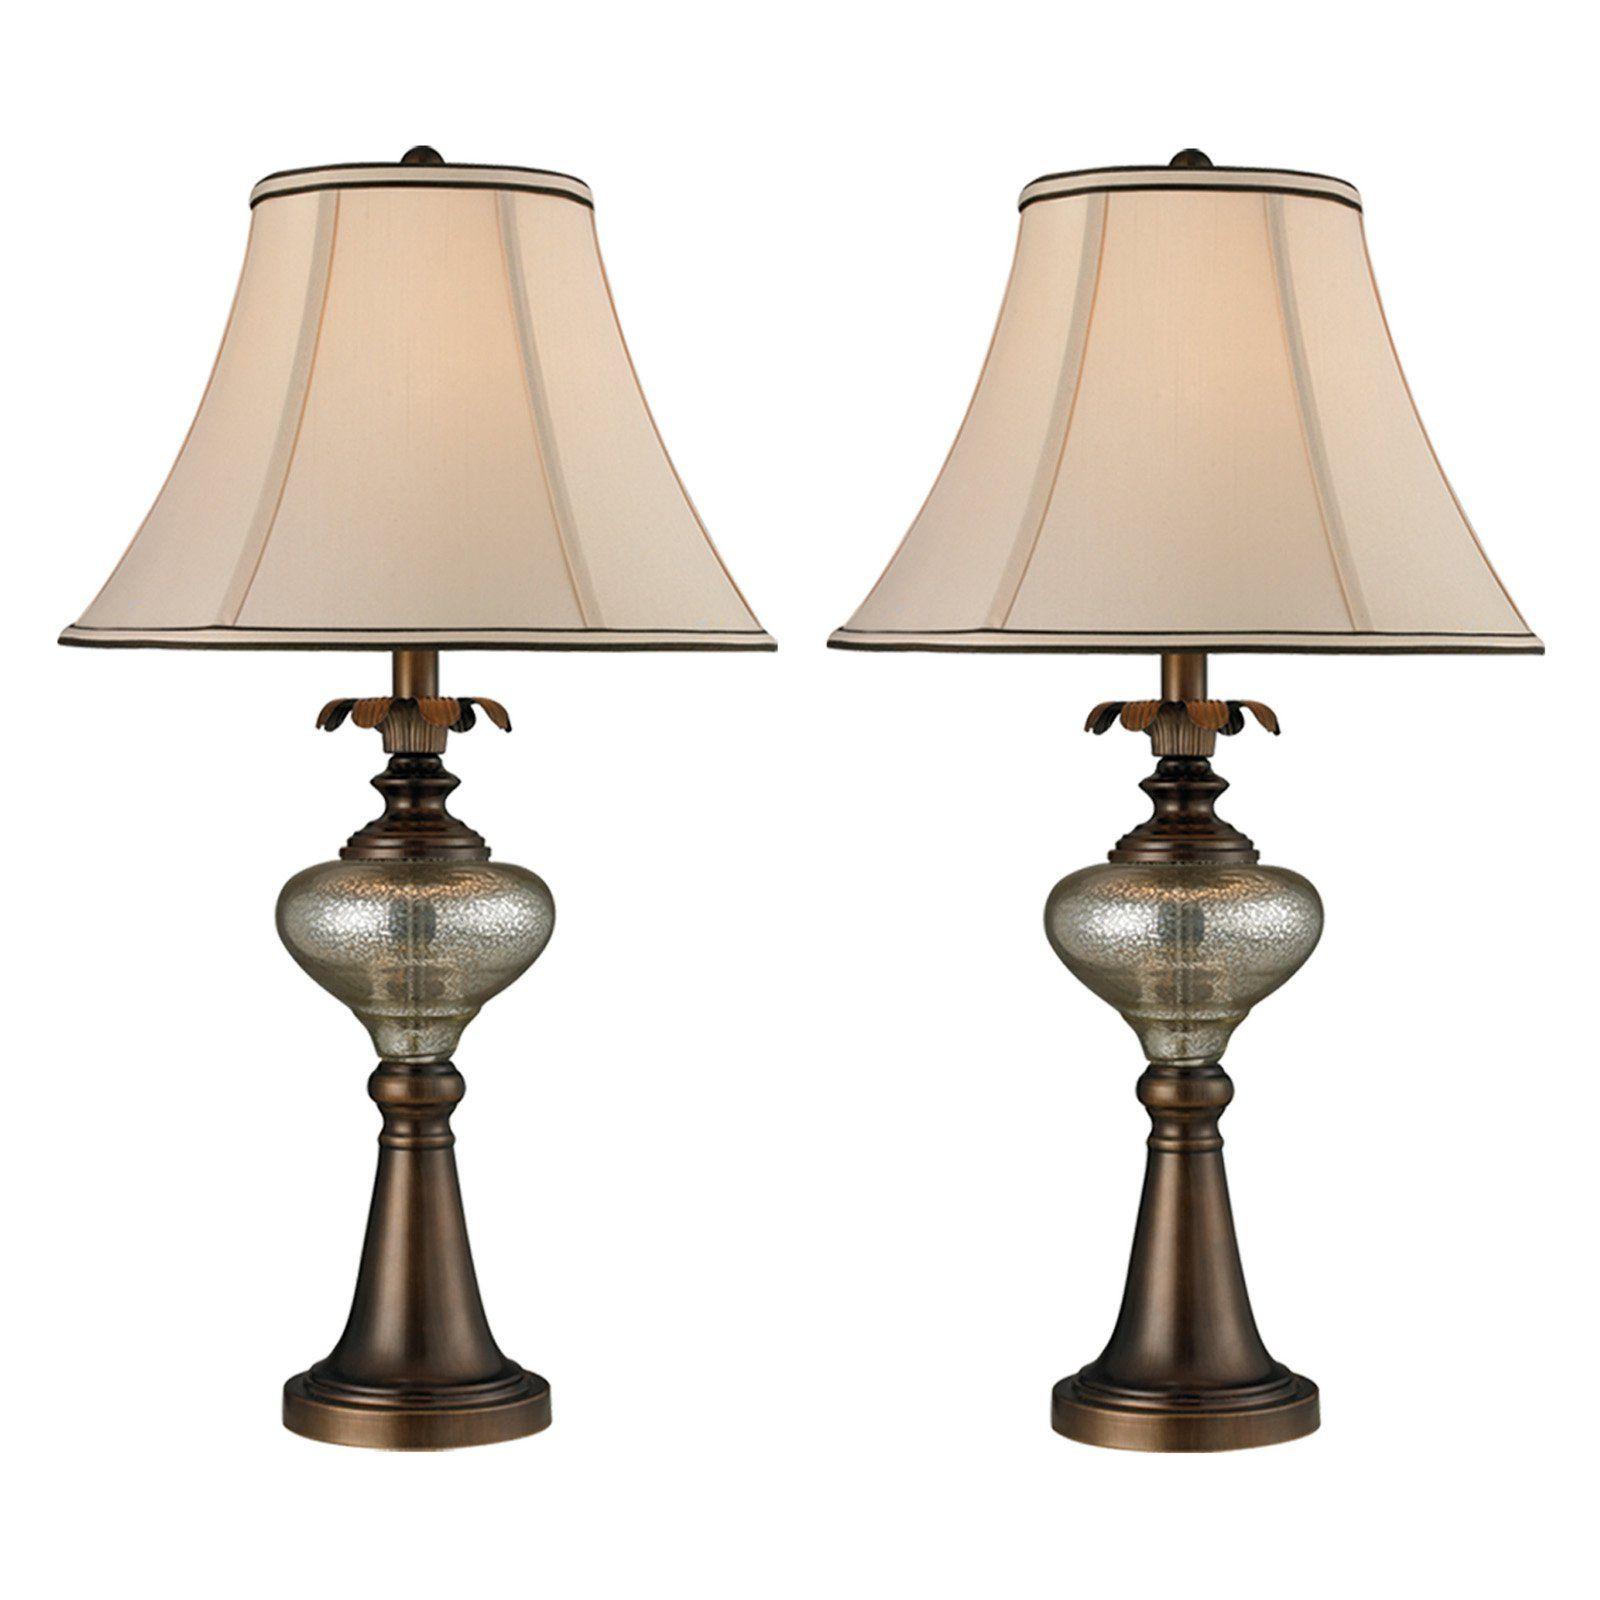 Springdale Lighting Bingham 2 Piece Table Lamp Set   PC14314